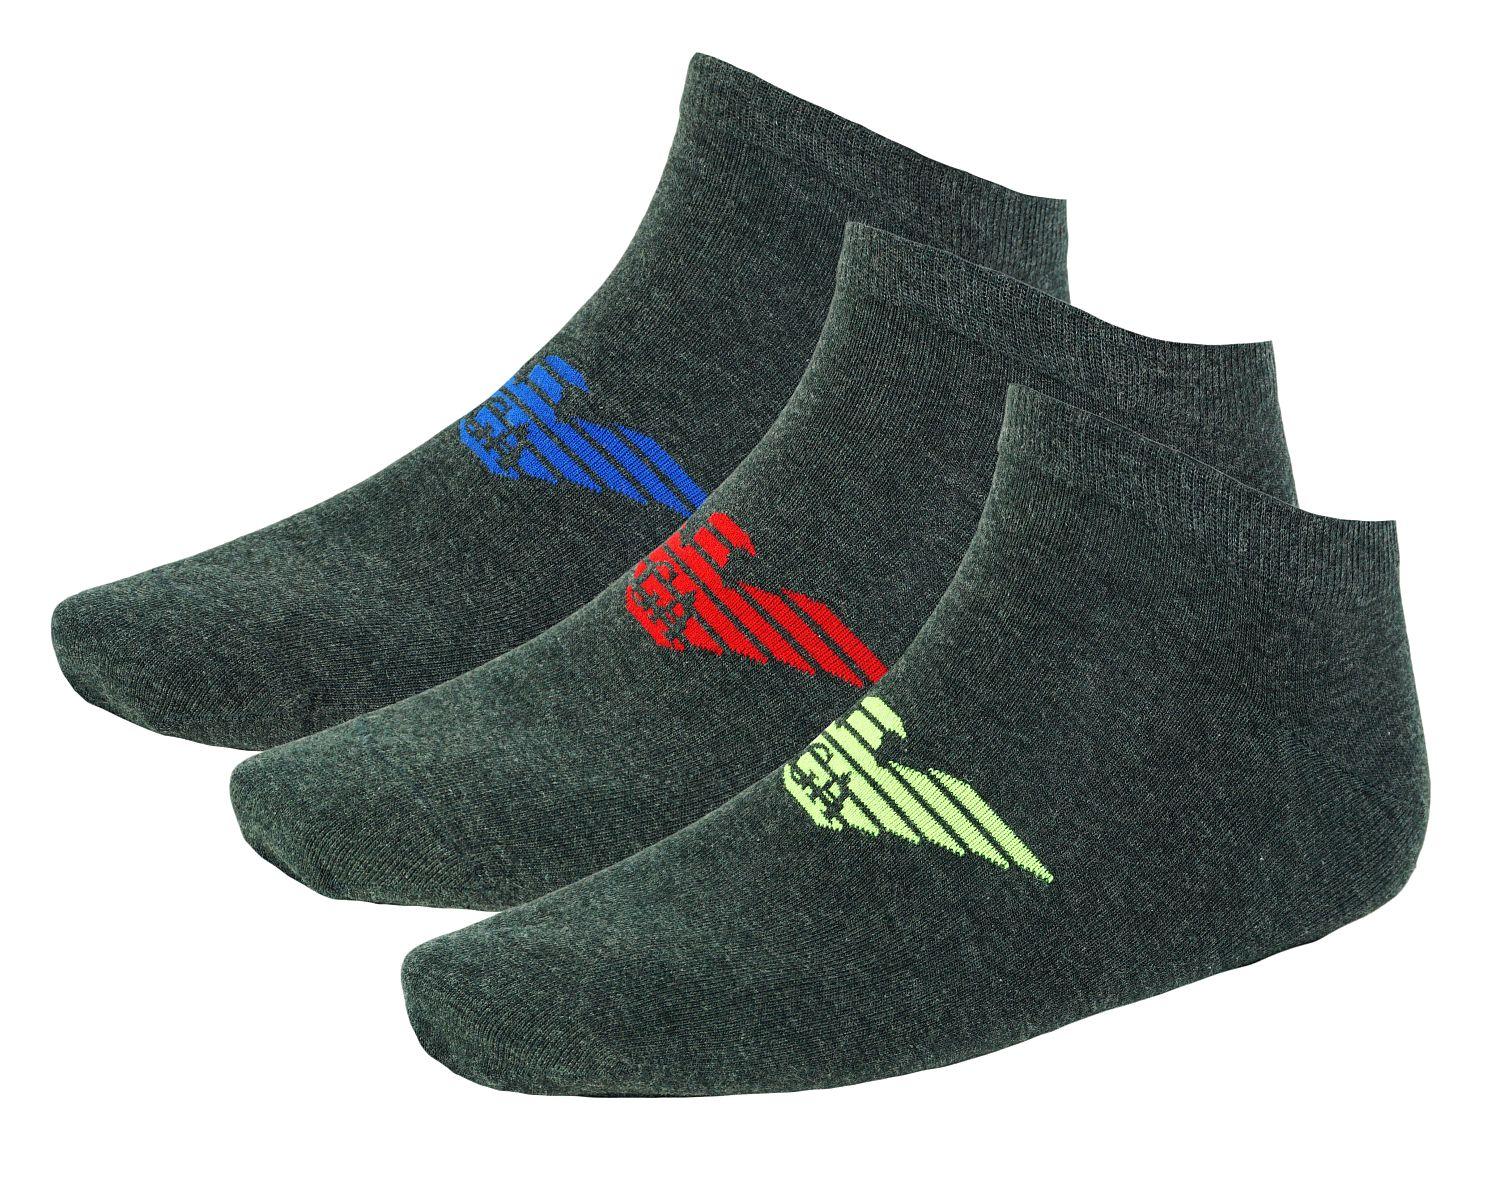 Emporio Armani 3er Pack Strümpfe Socken 8929BX Calza Inside 300008 7A234 00349 HW17-EAX1